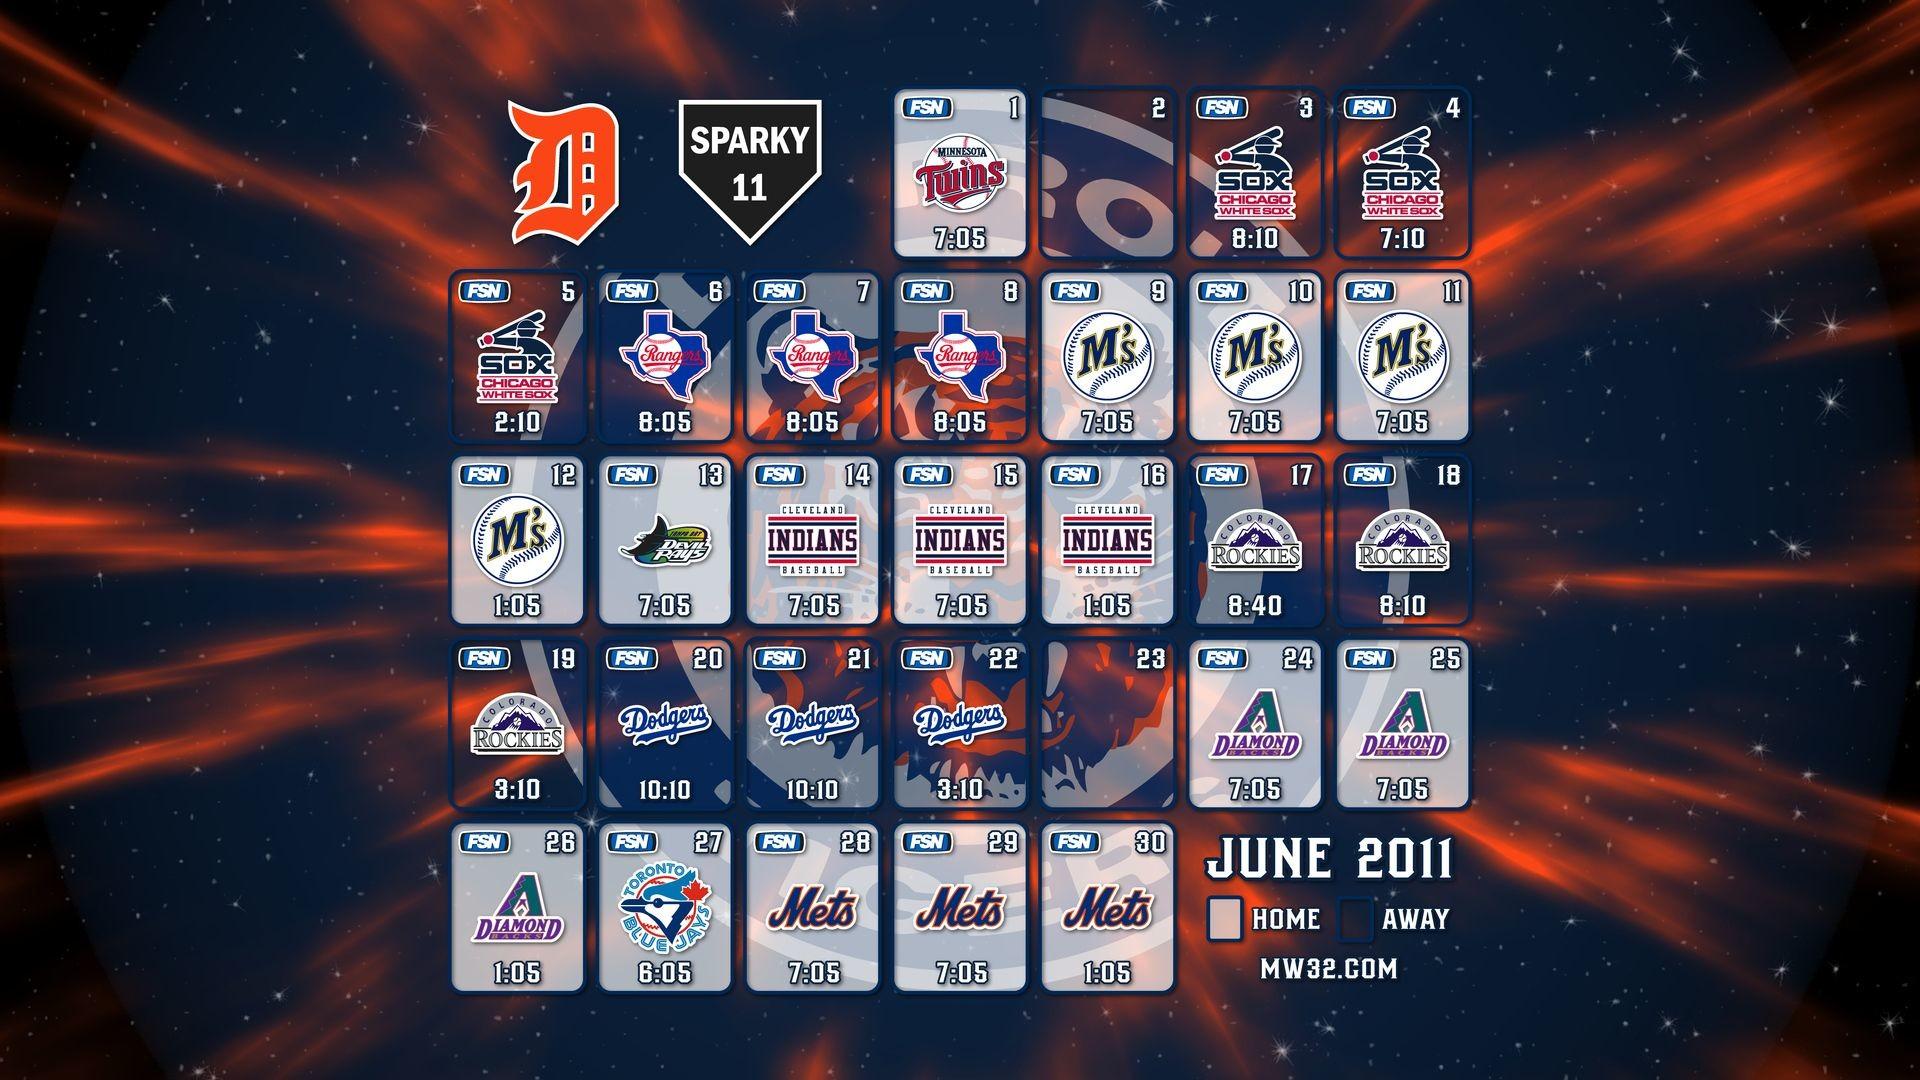 Detroit Tigers Wallpapers 2015 Schedule – Wallpaper Cave